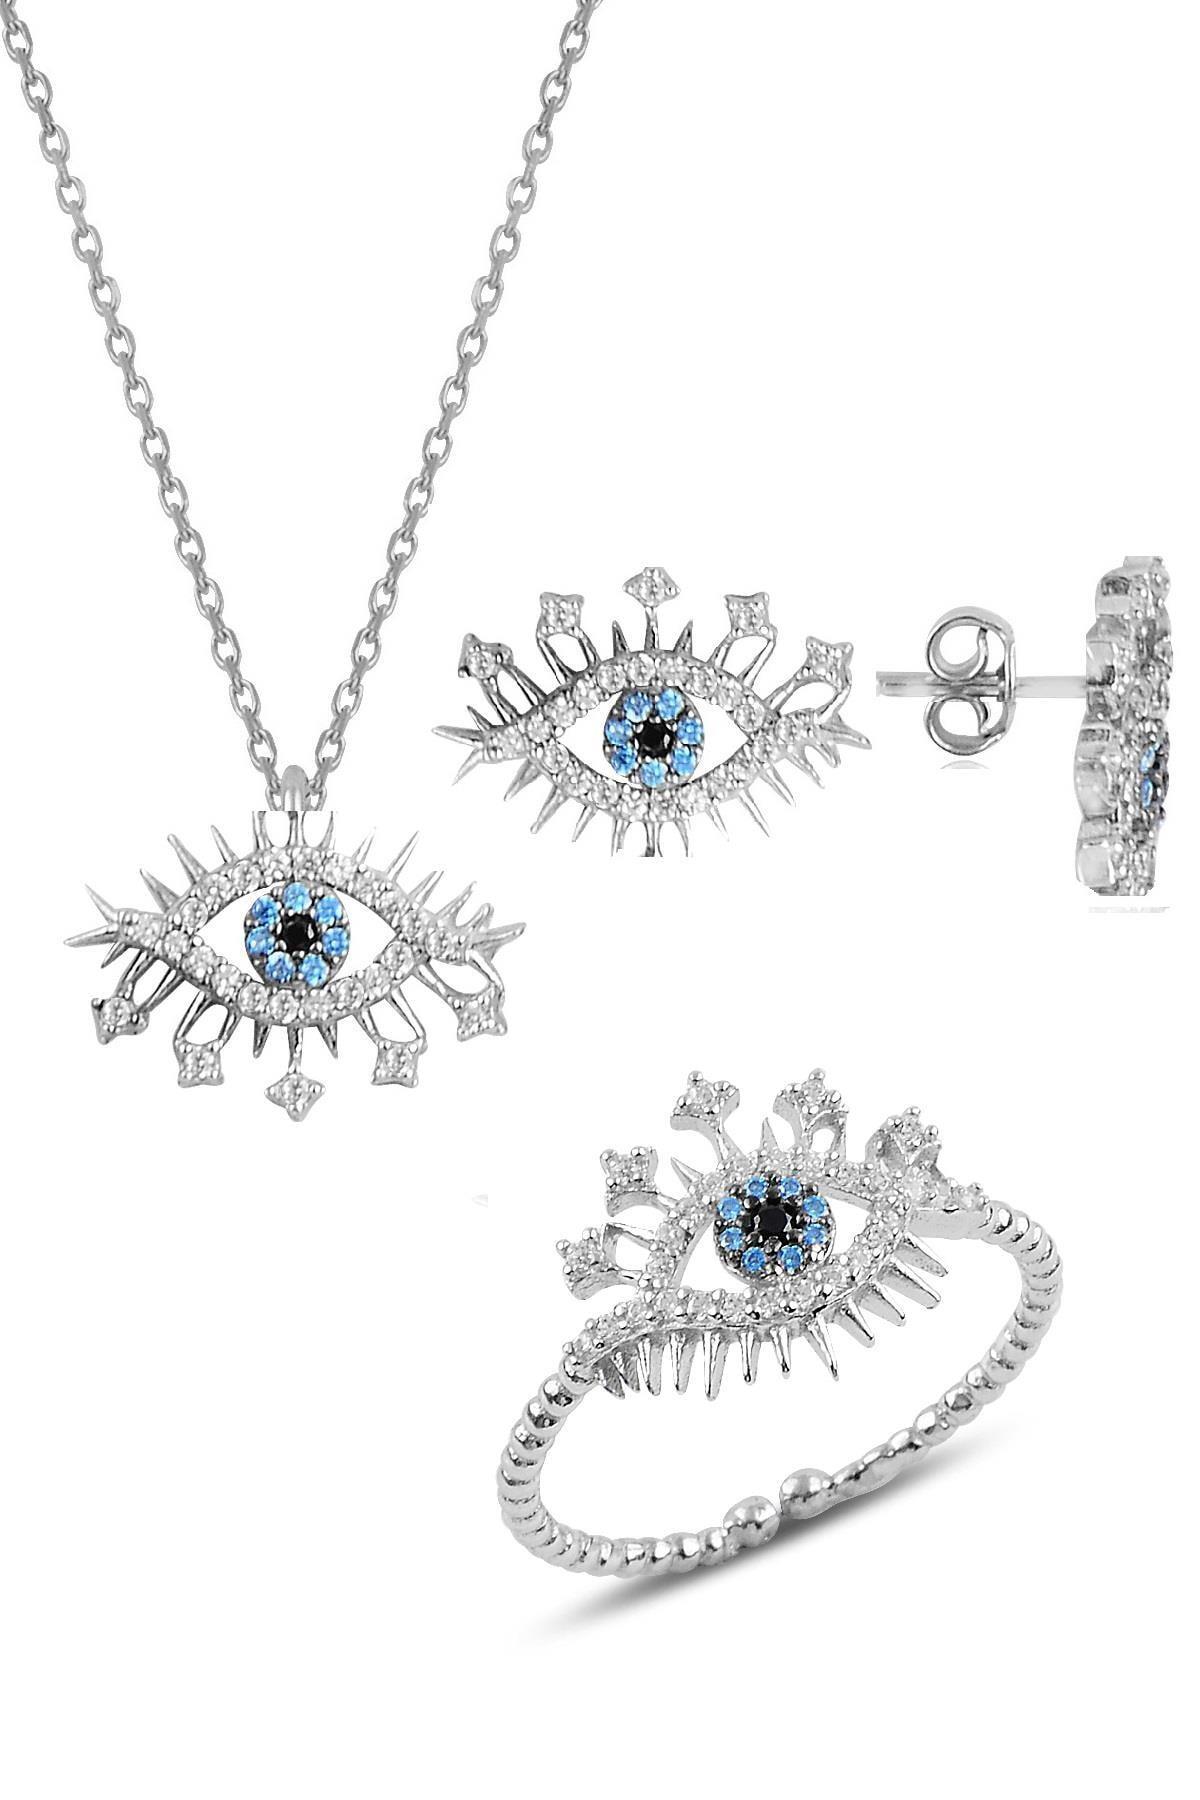 Söğütlü Silver Gümüş rodyumlu zirkon taşlı lareyn kolye küpe ve yüzük gümüş set